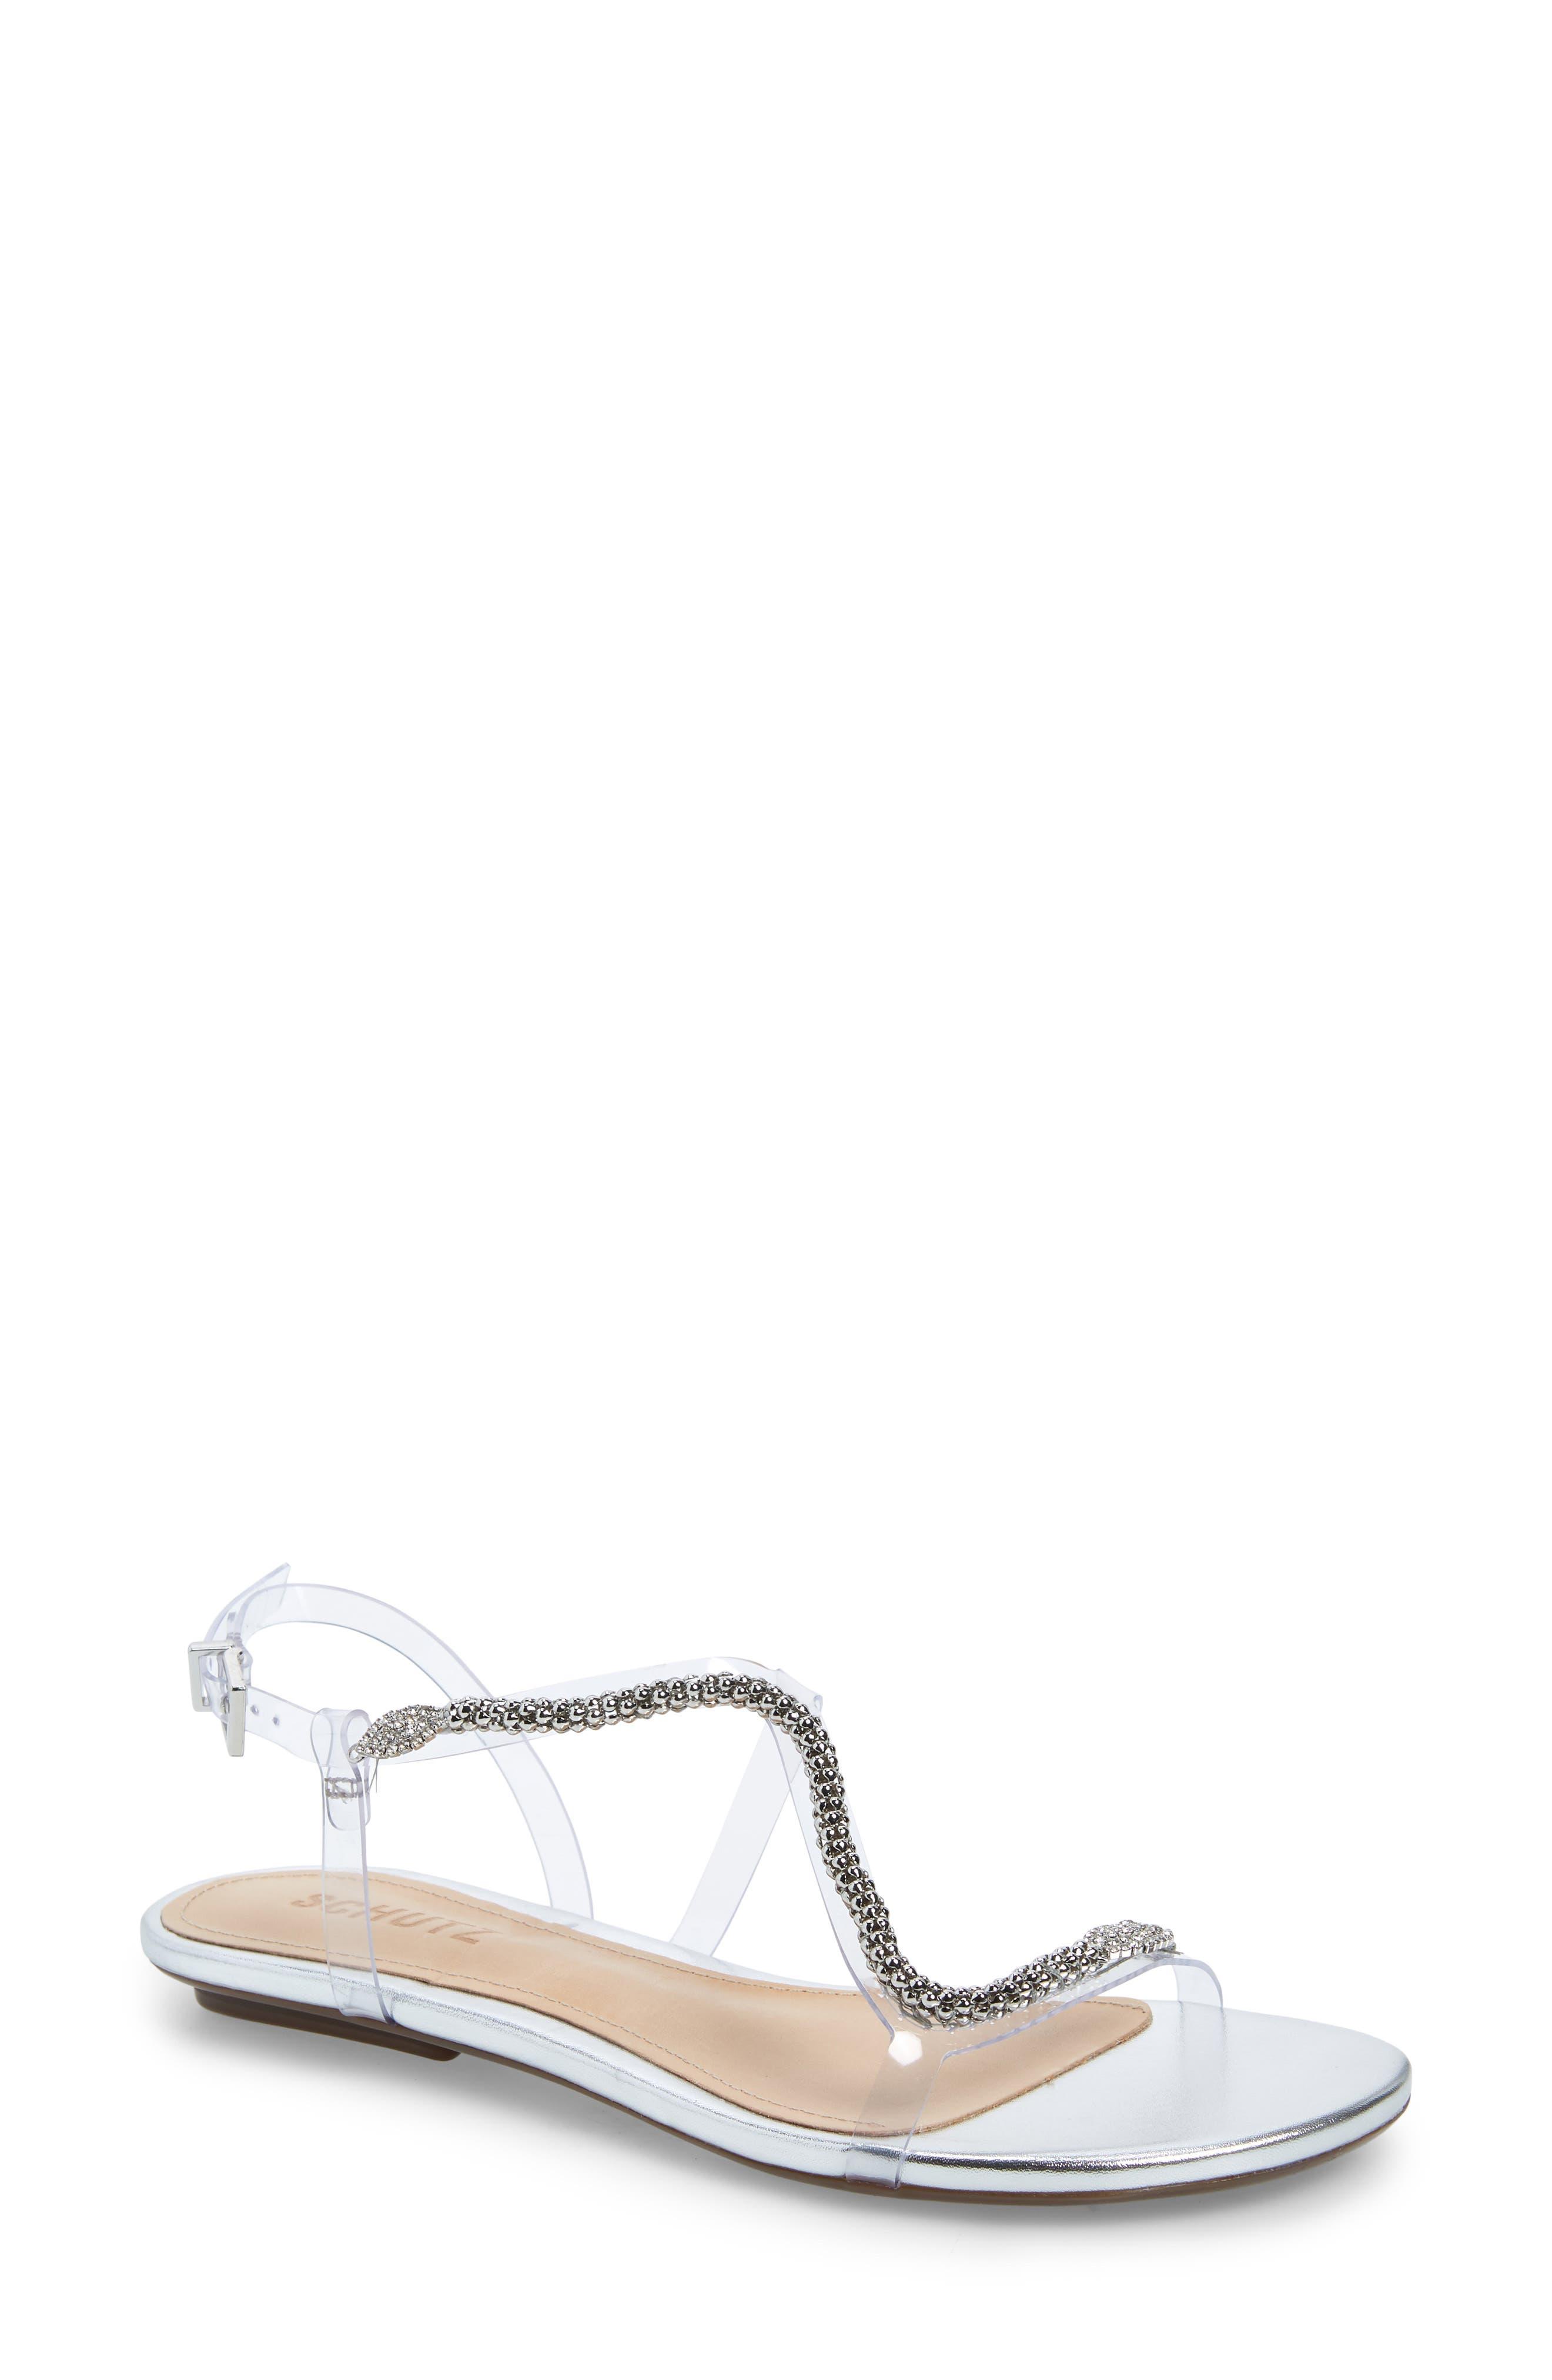 Schutz Gabbyl Embellished Sandal, Metallic